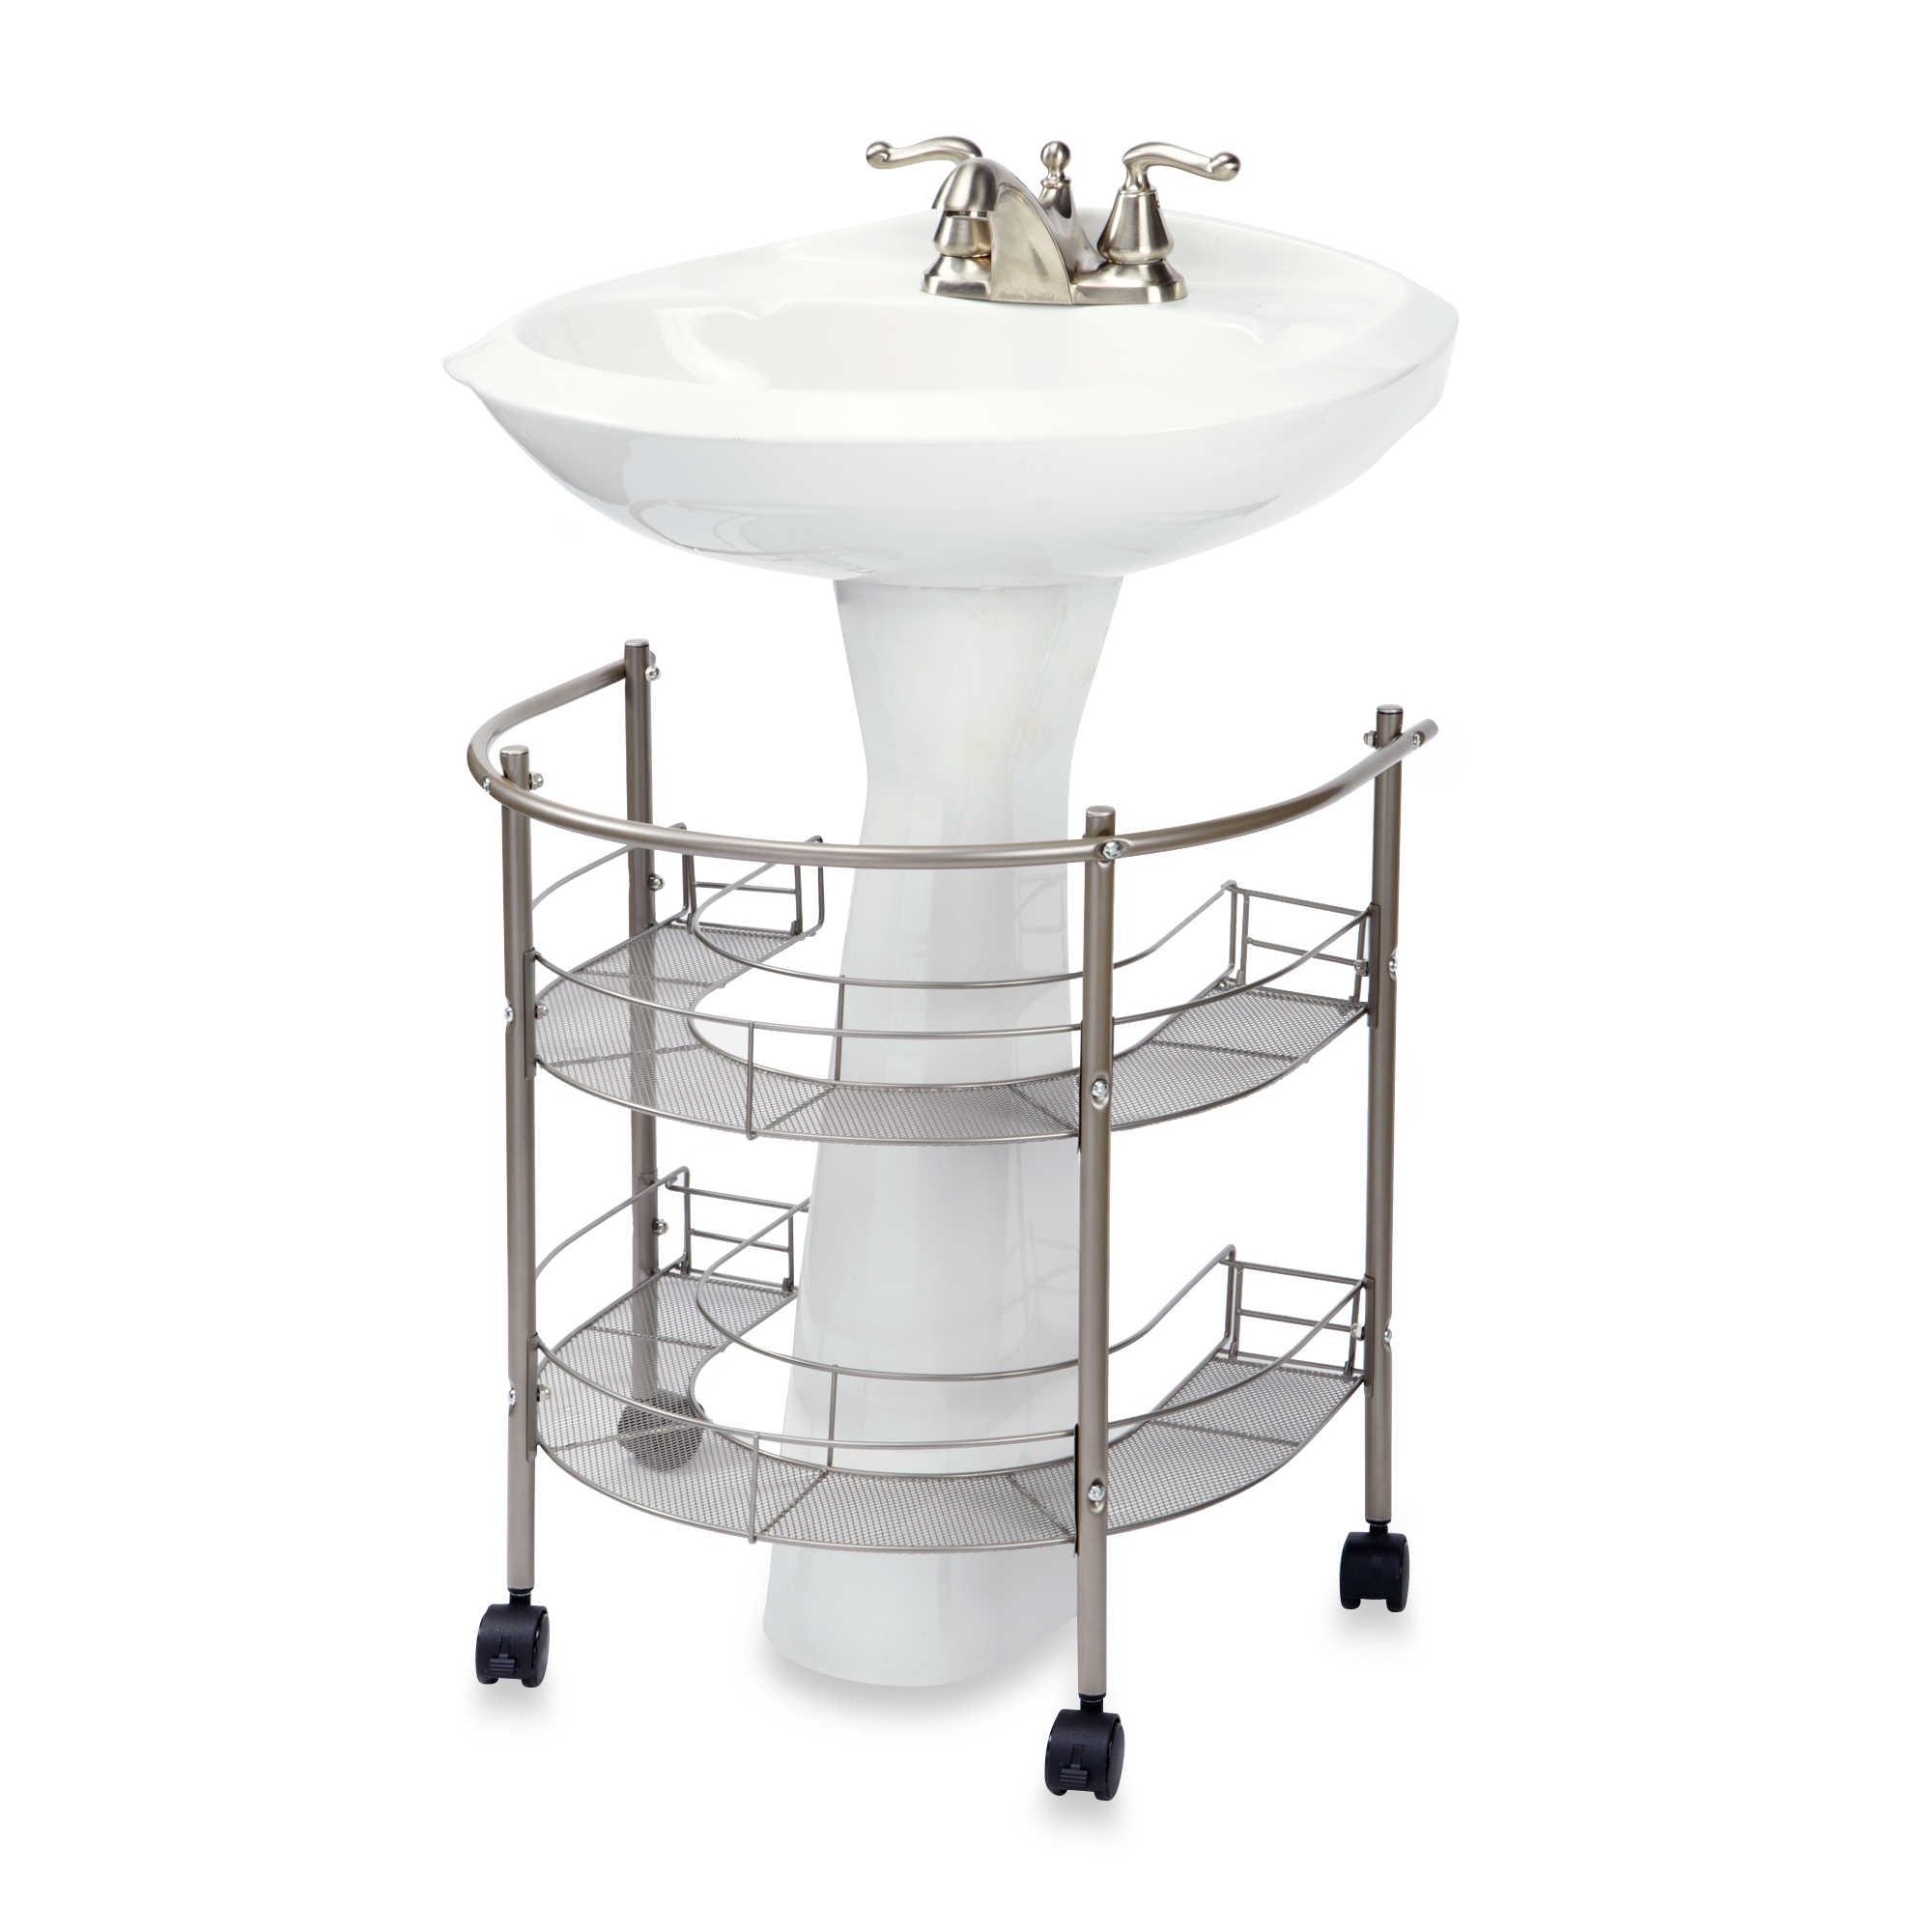 Bathroom Storage Ideas - Storage For Small Bathrooms ...